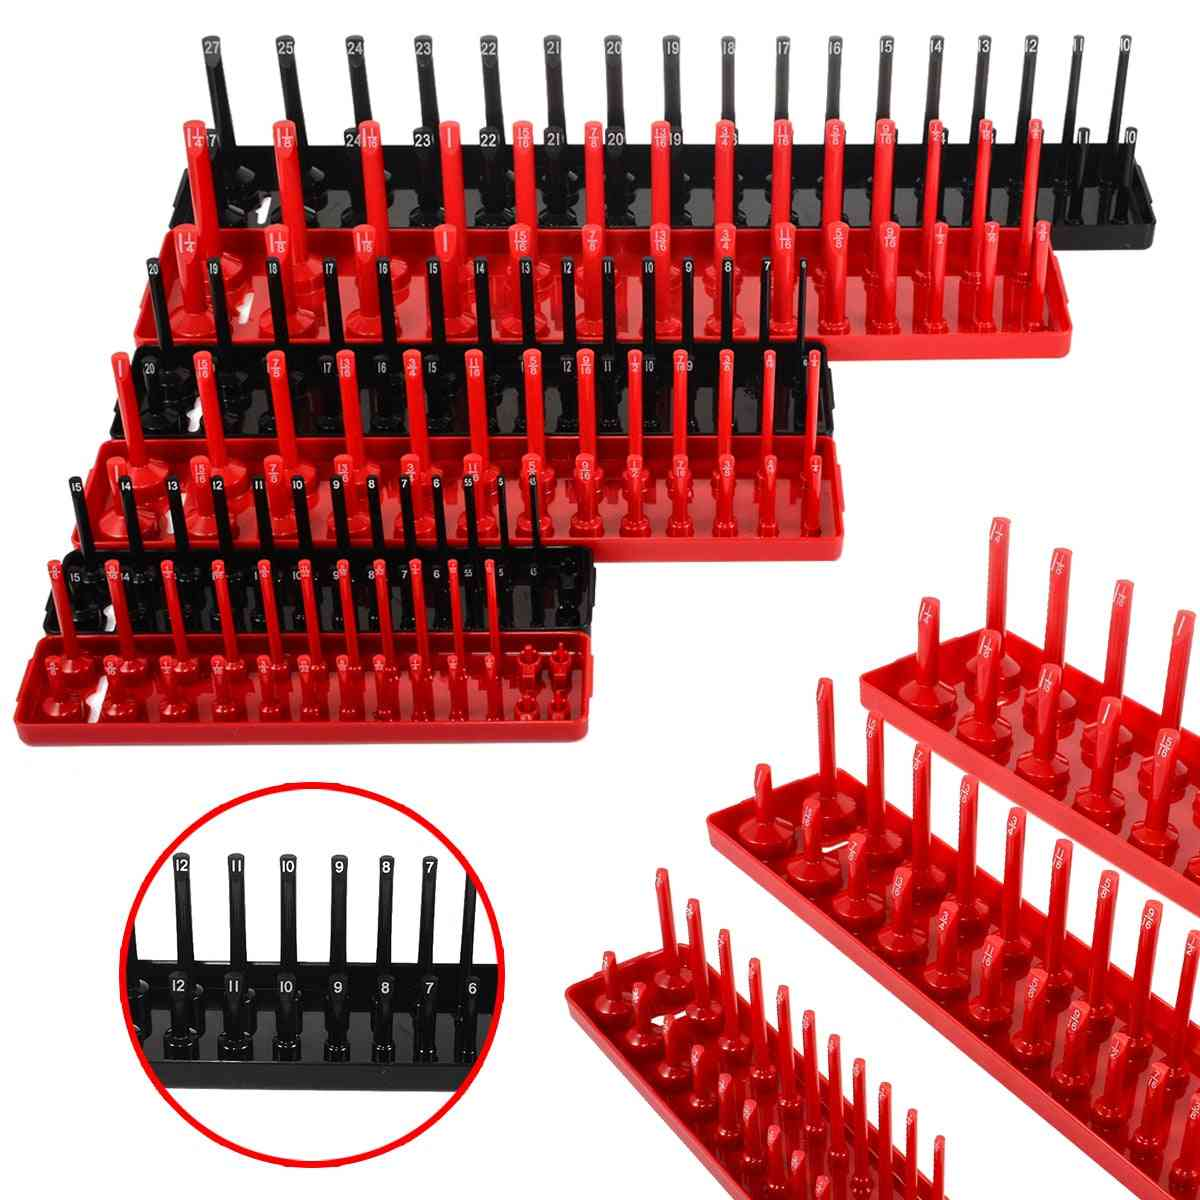 Multifunctional Socket Organizer Cabinets Socket Tray